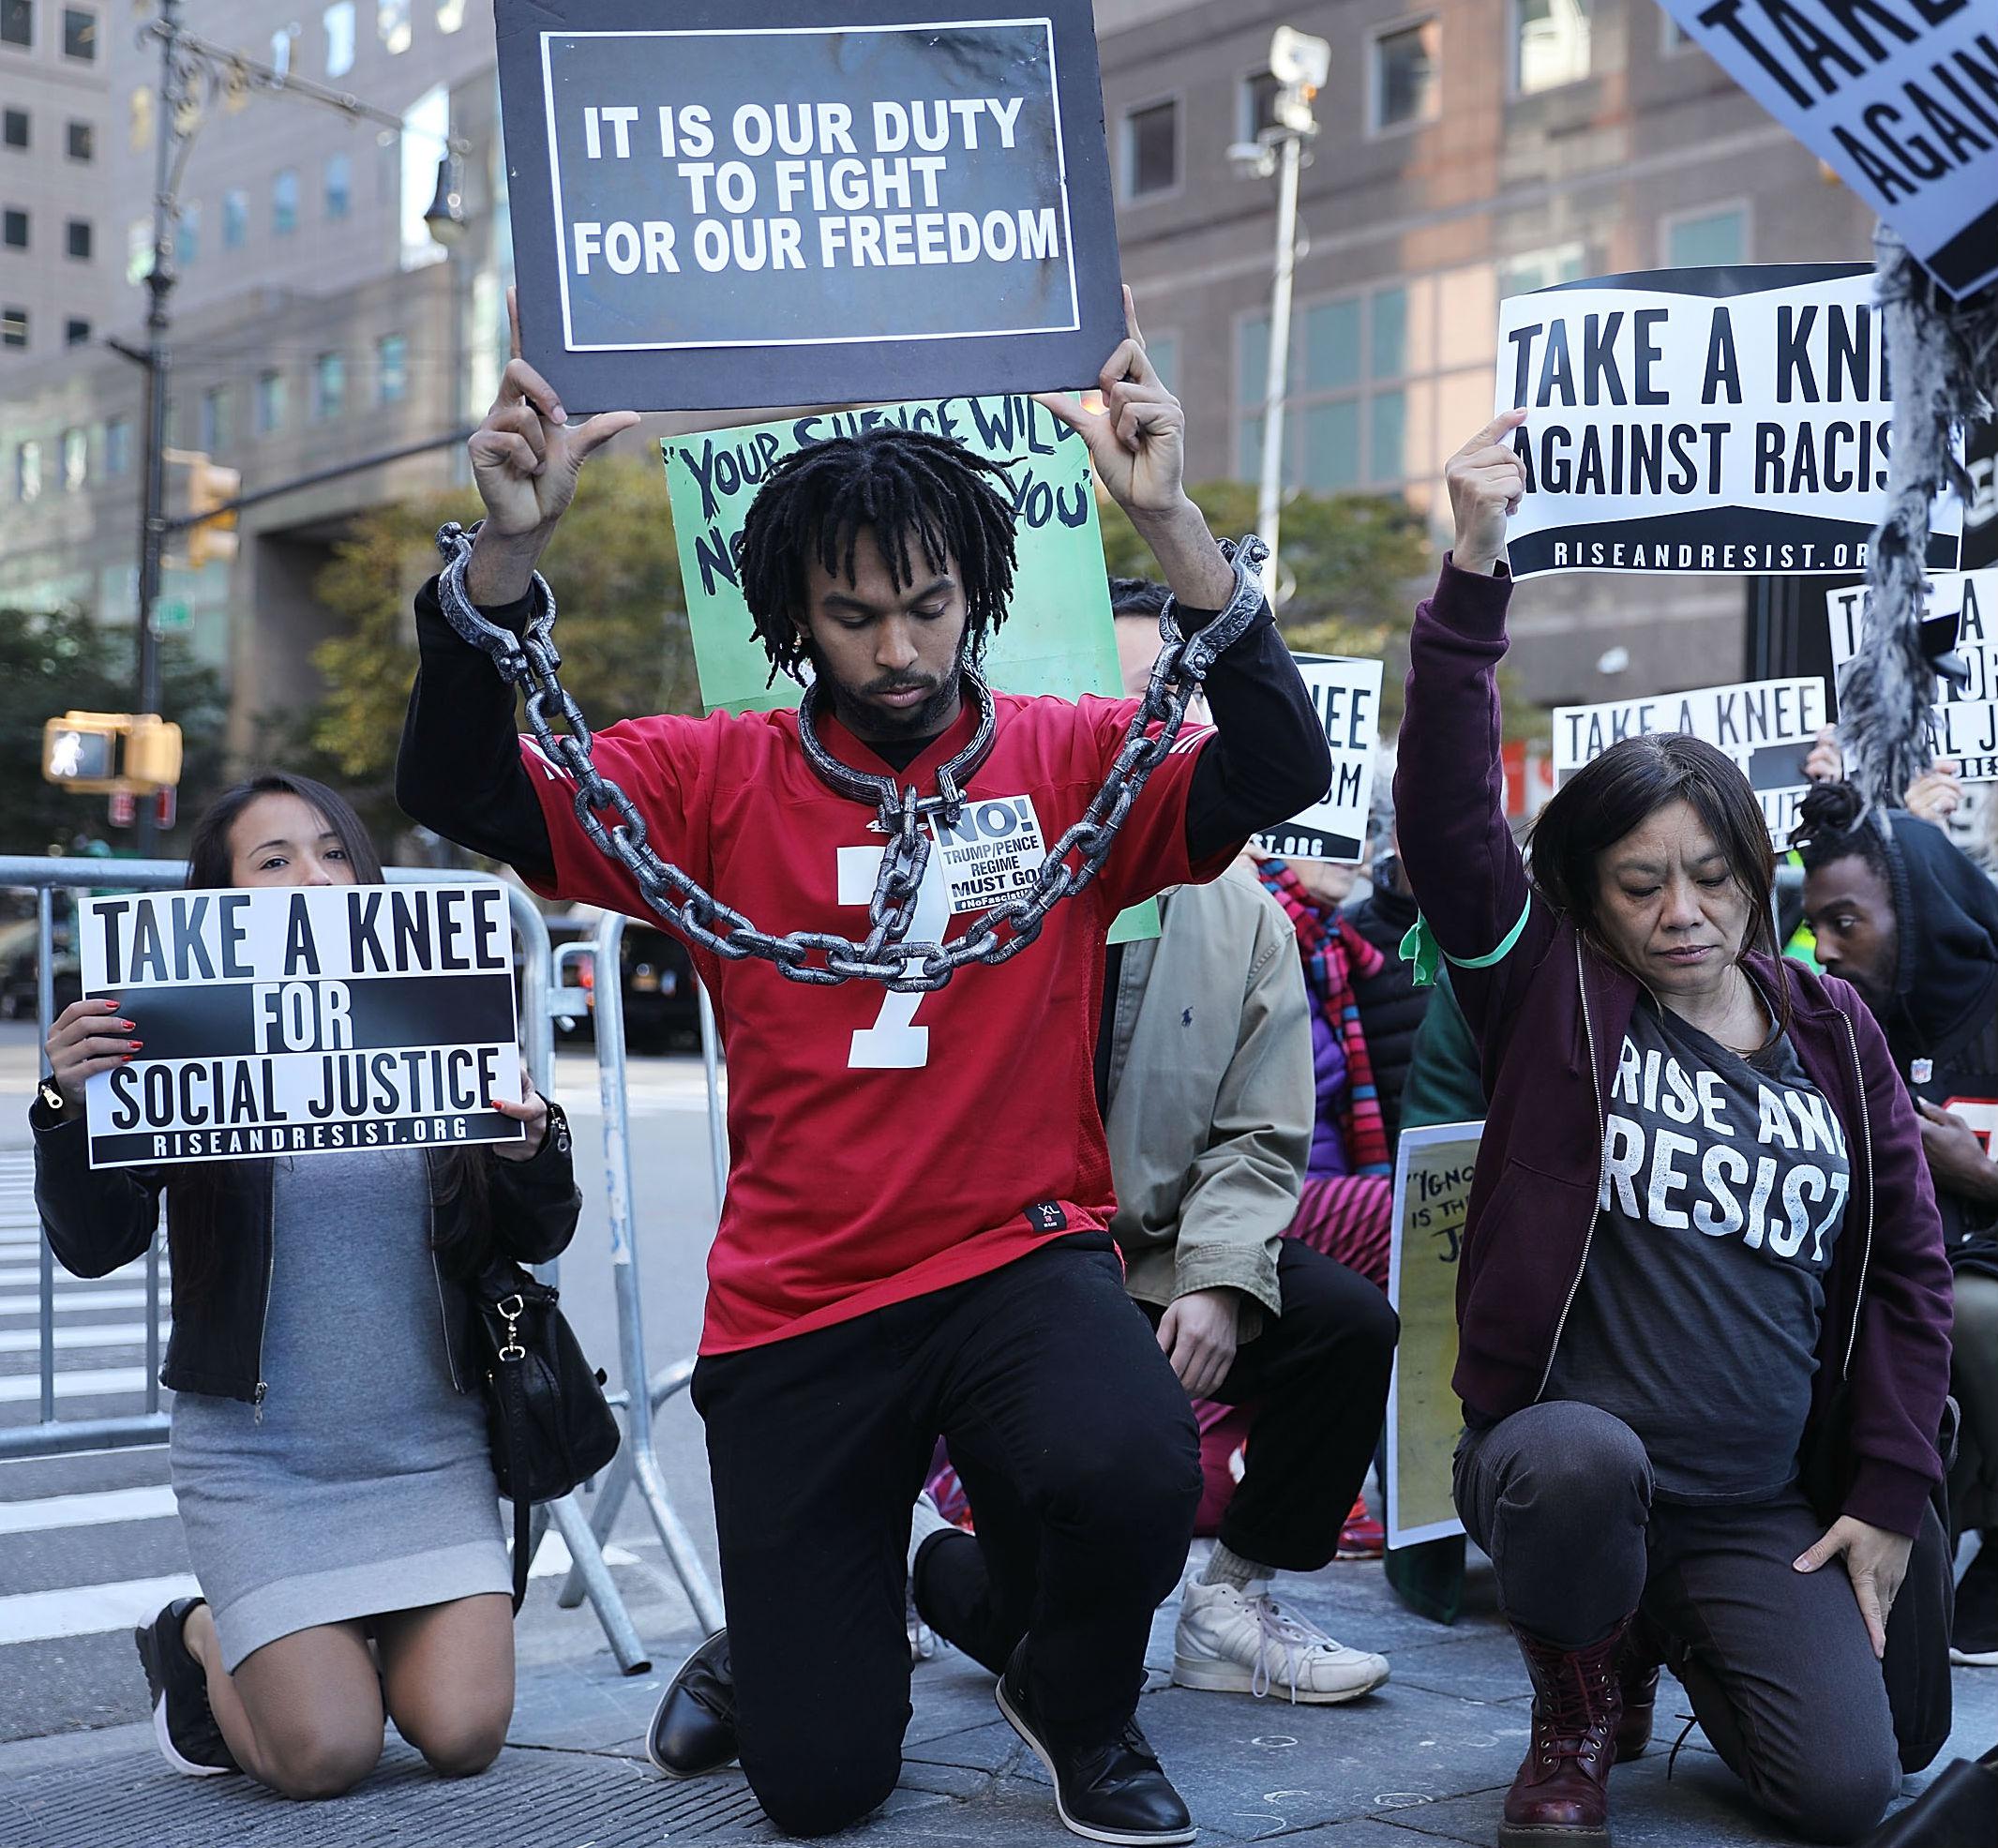 Kaepernick-activist-101717-Getty.jpg